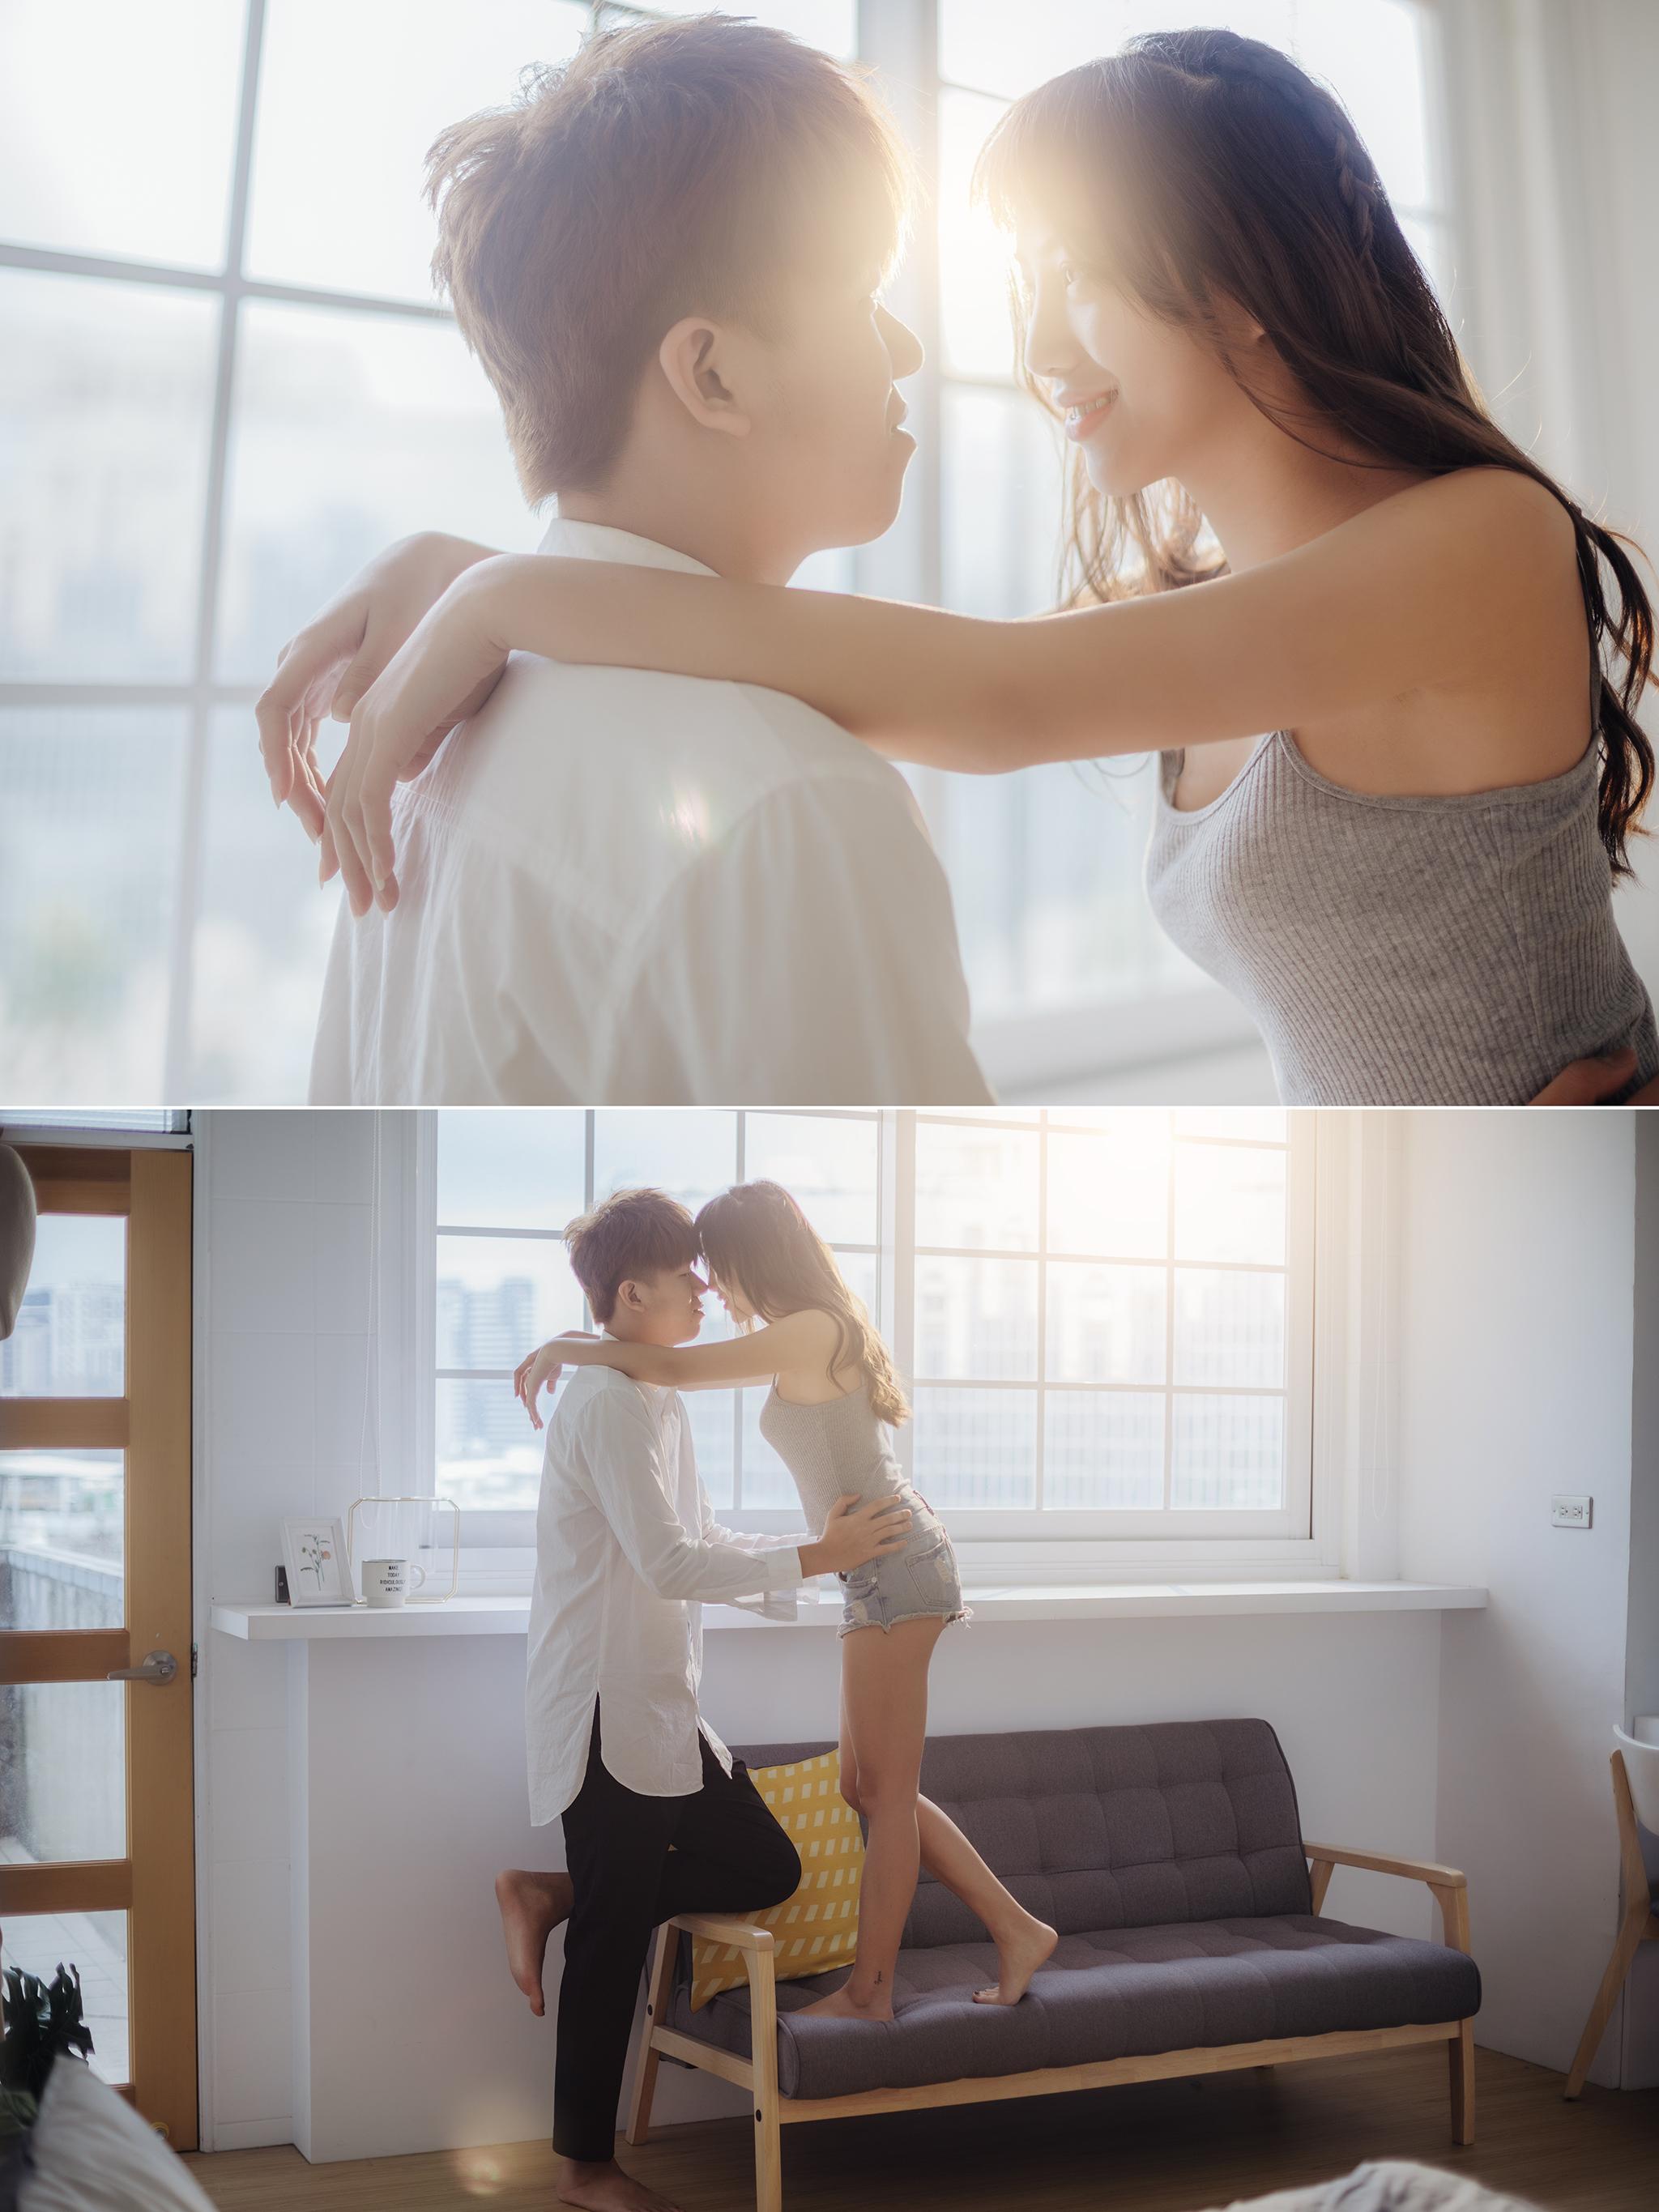 46851200241 dbedbd00db o - 【情侶寫真】+Isaac & Syuan+